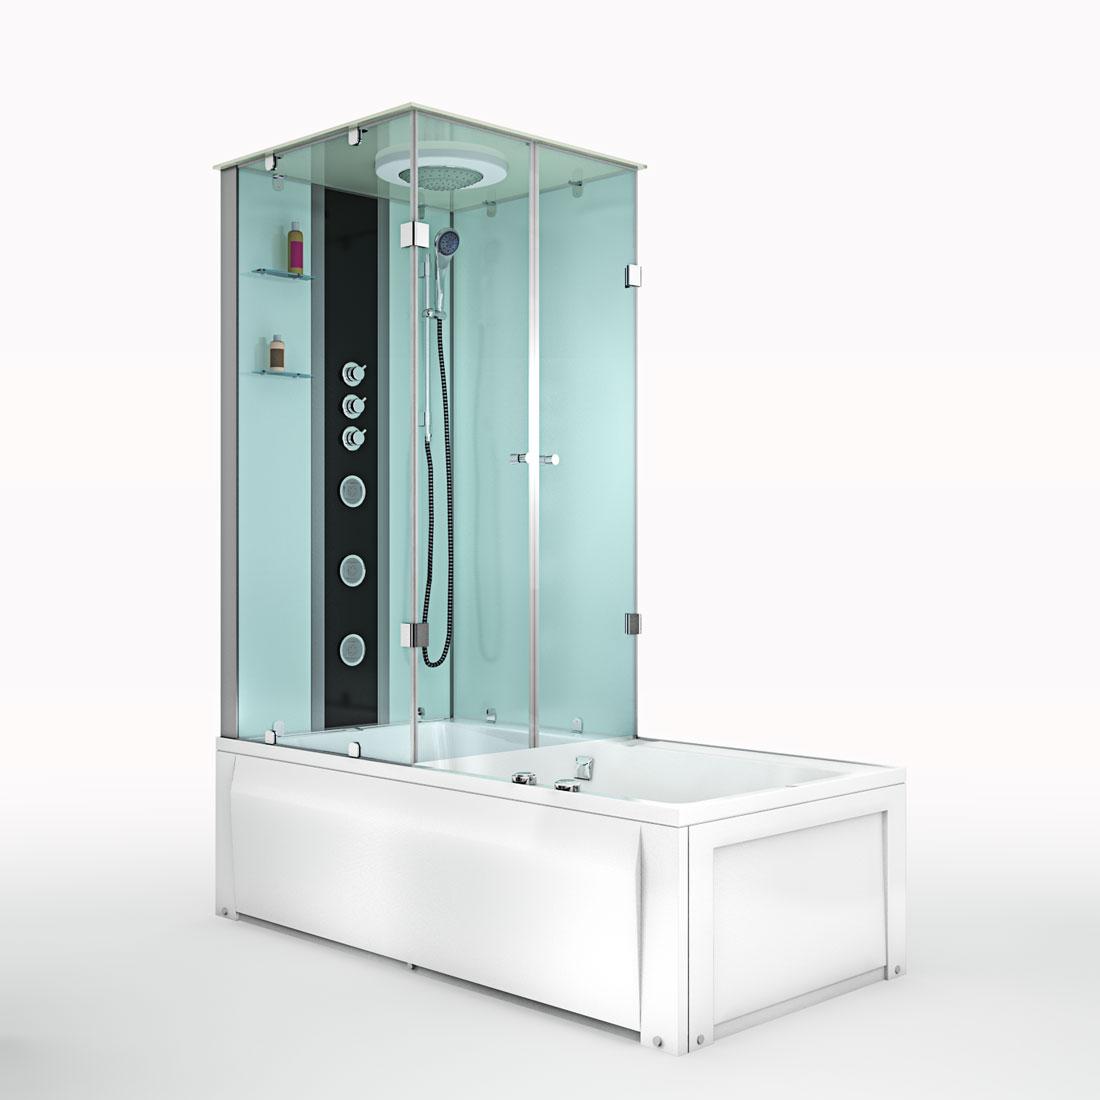 acquavapore dtp50 a006r dusch wannen kombi in 90x180cm trendbad24. Black Bedroom Furniture Sets. Home Design Ideas